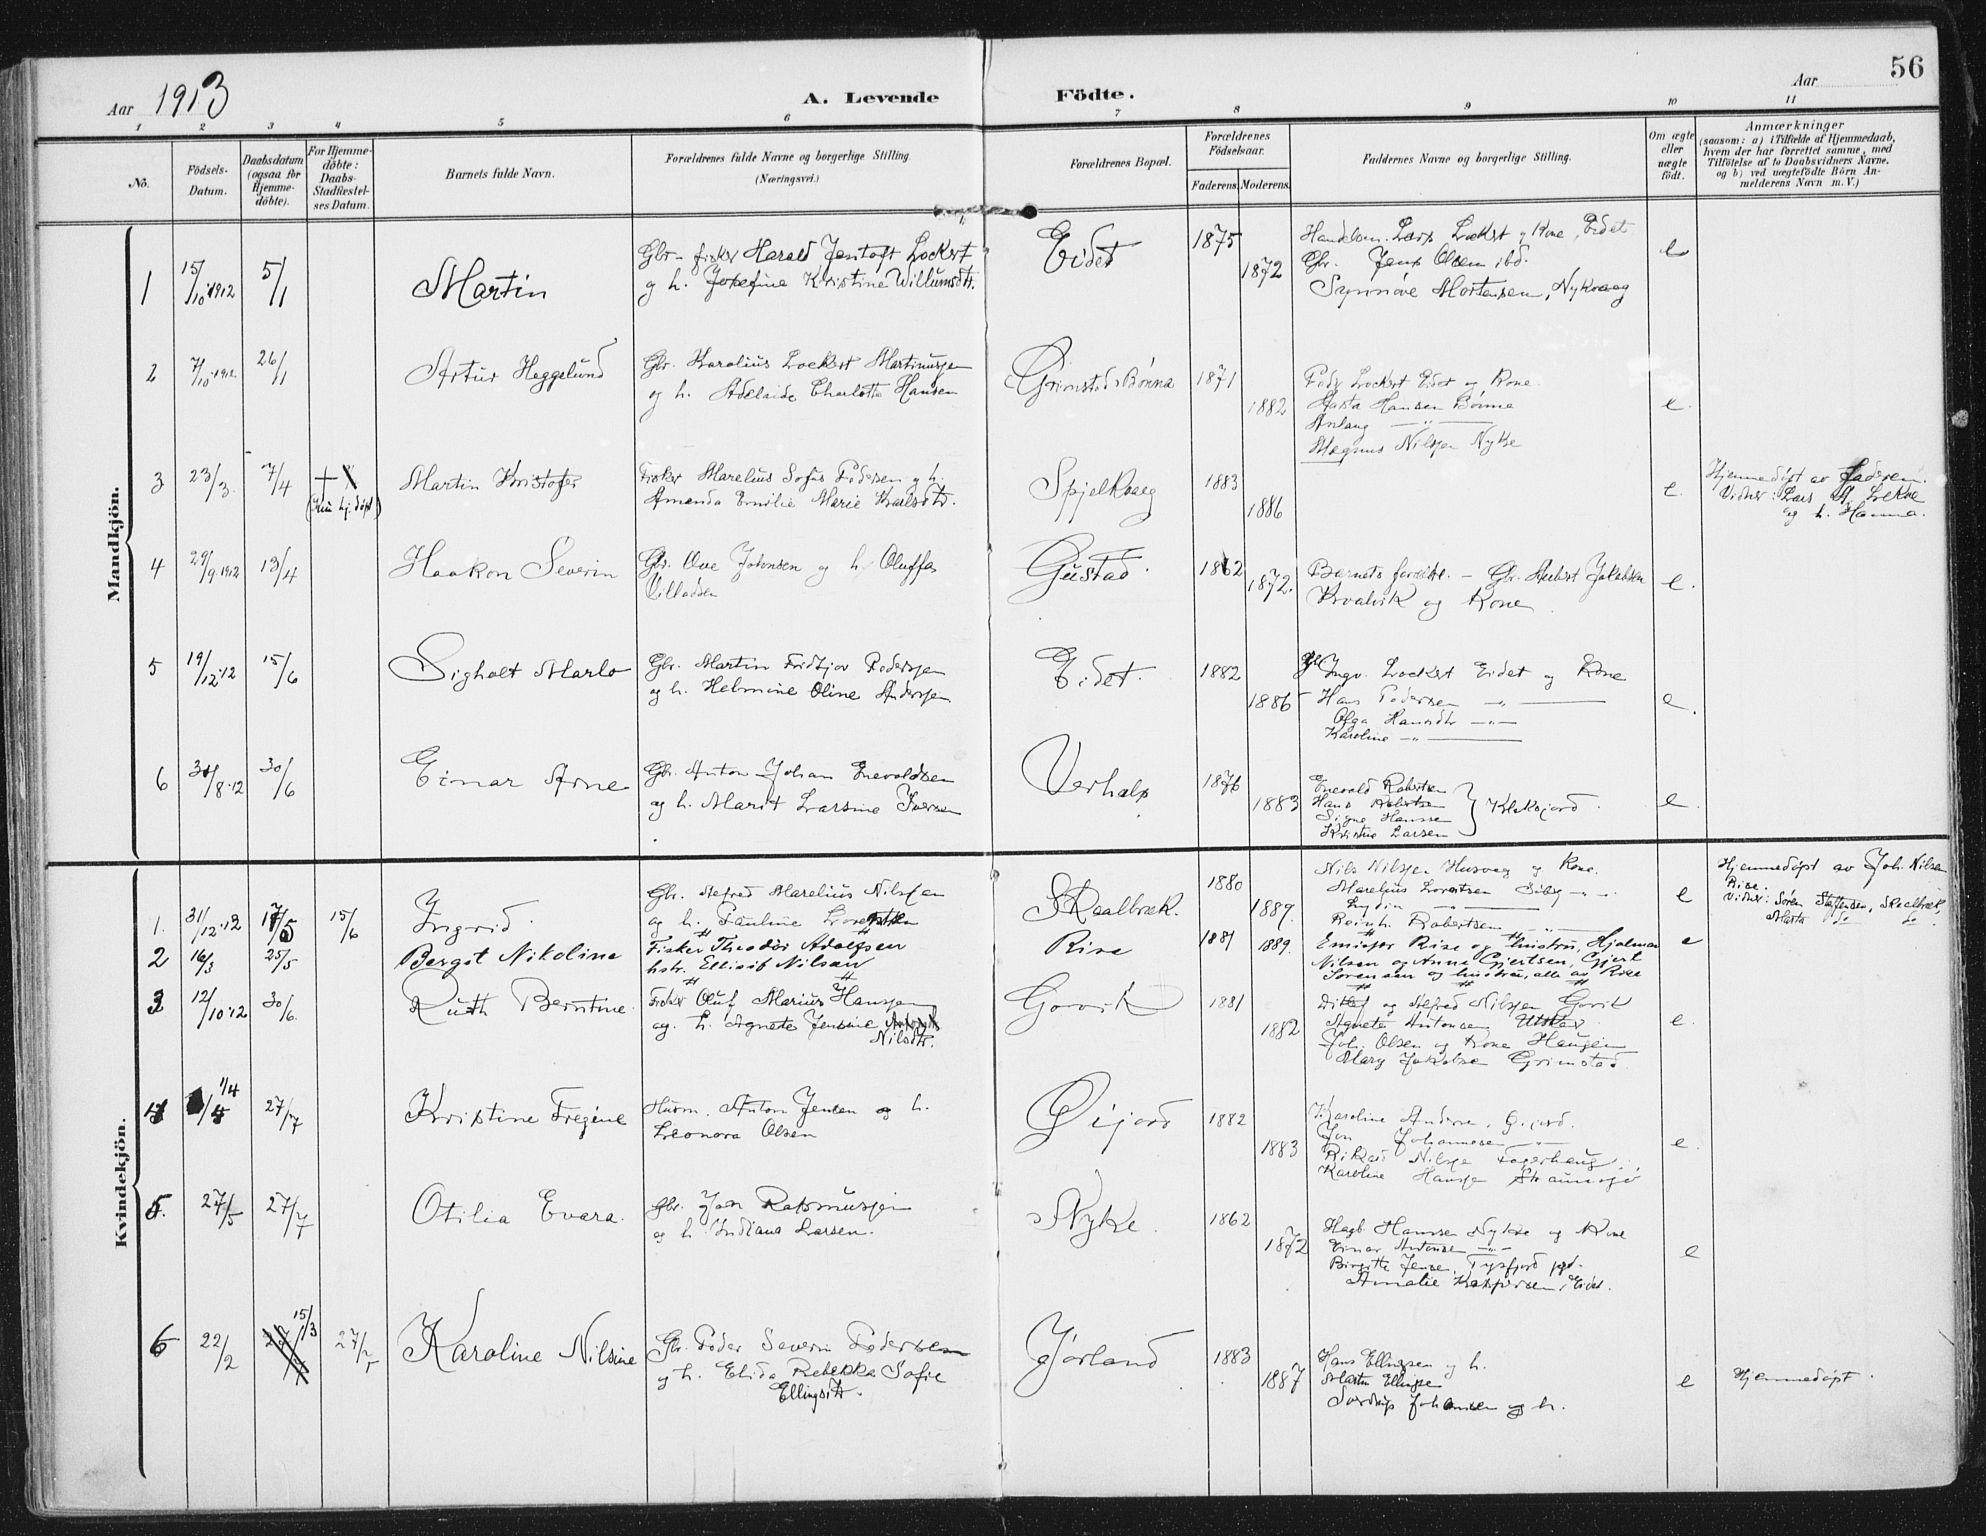 SAT, Ministerialprotokoller, klokkerbøker og fødselsregistre - Nordland, 892/L1321: Ministerialbok nr. 892A02, 1902-1918, s. 56